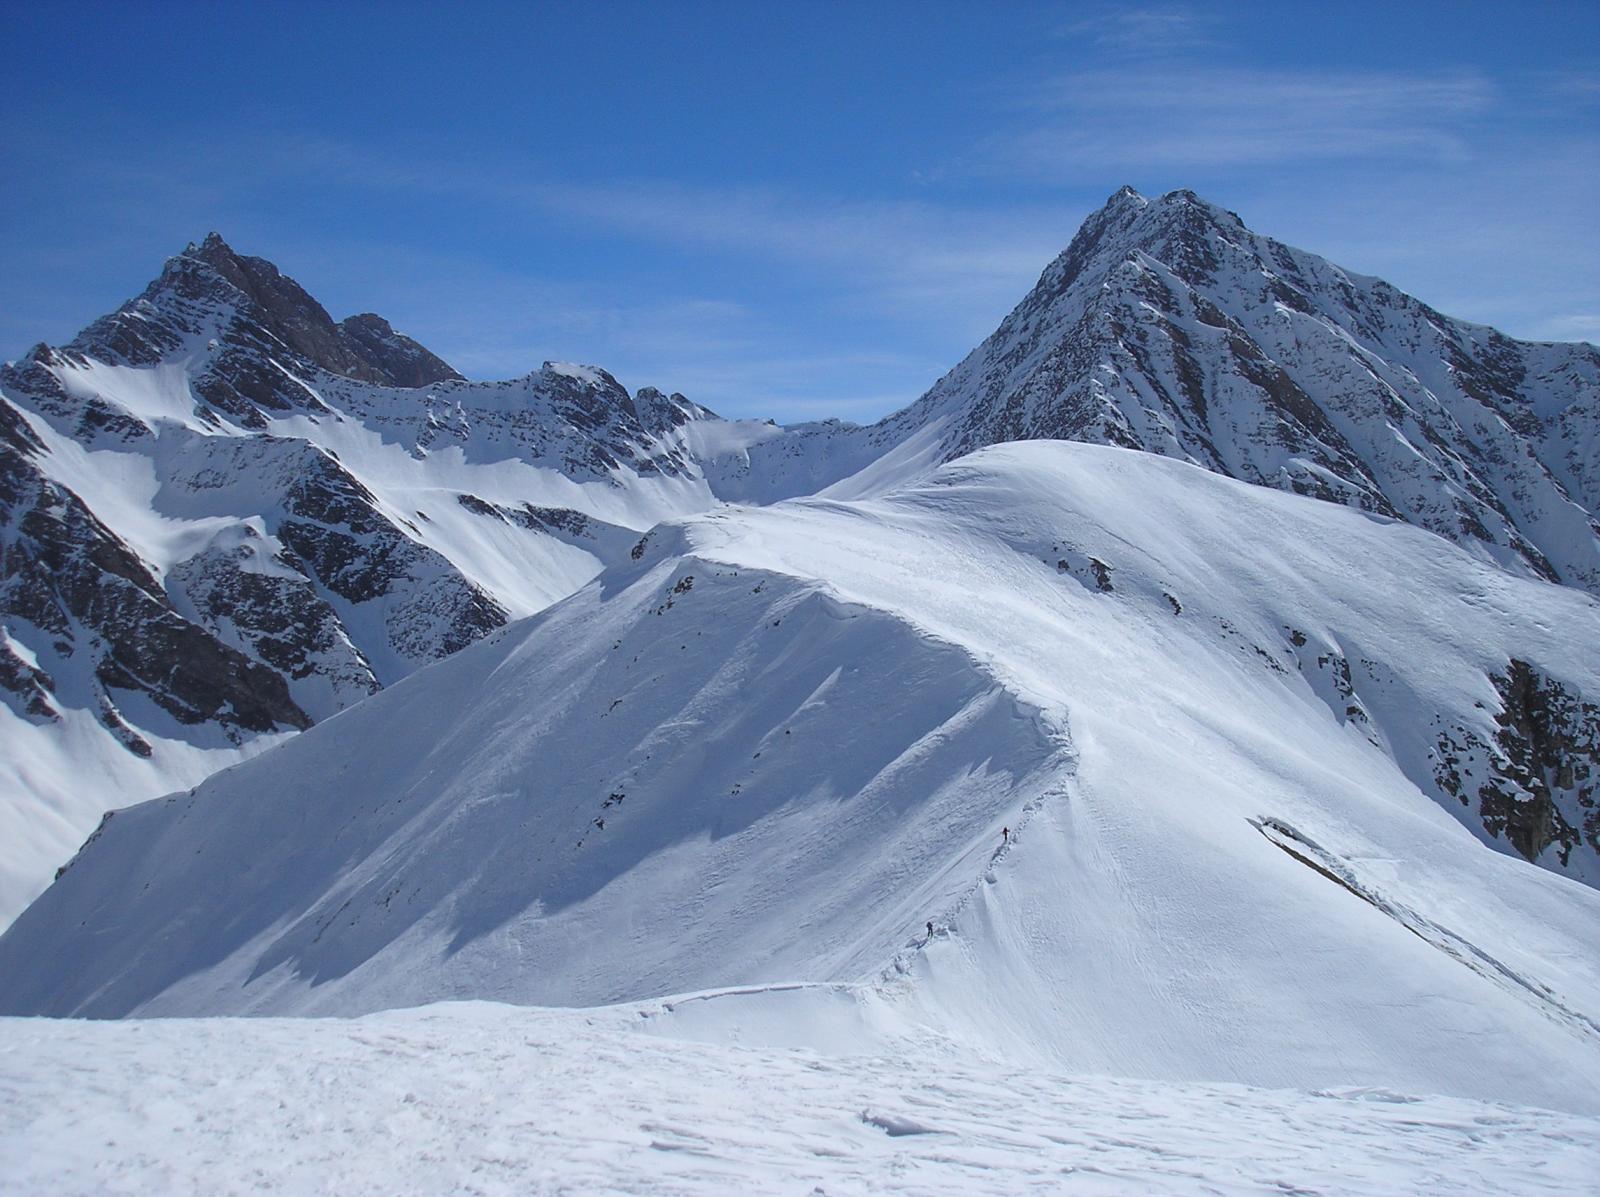 due skialp sulla cresta